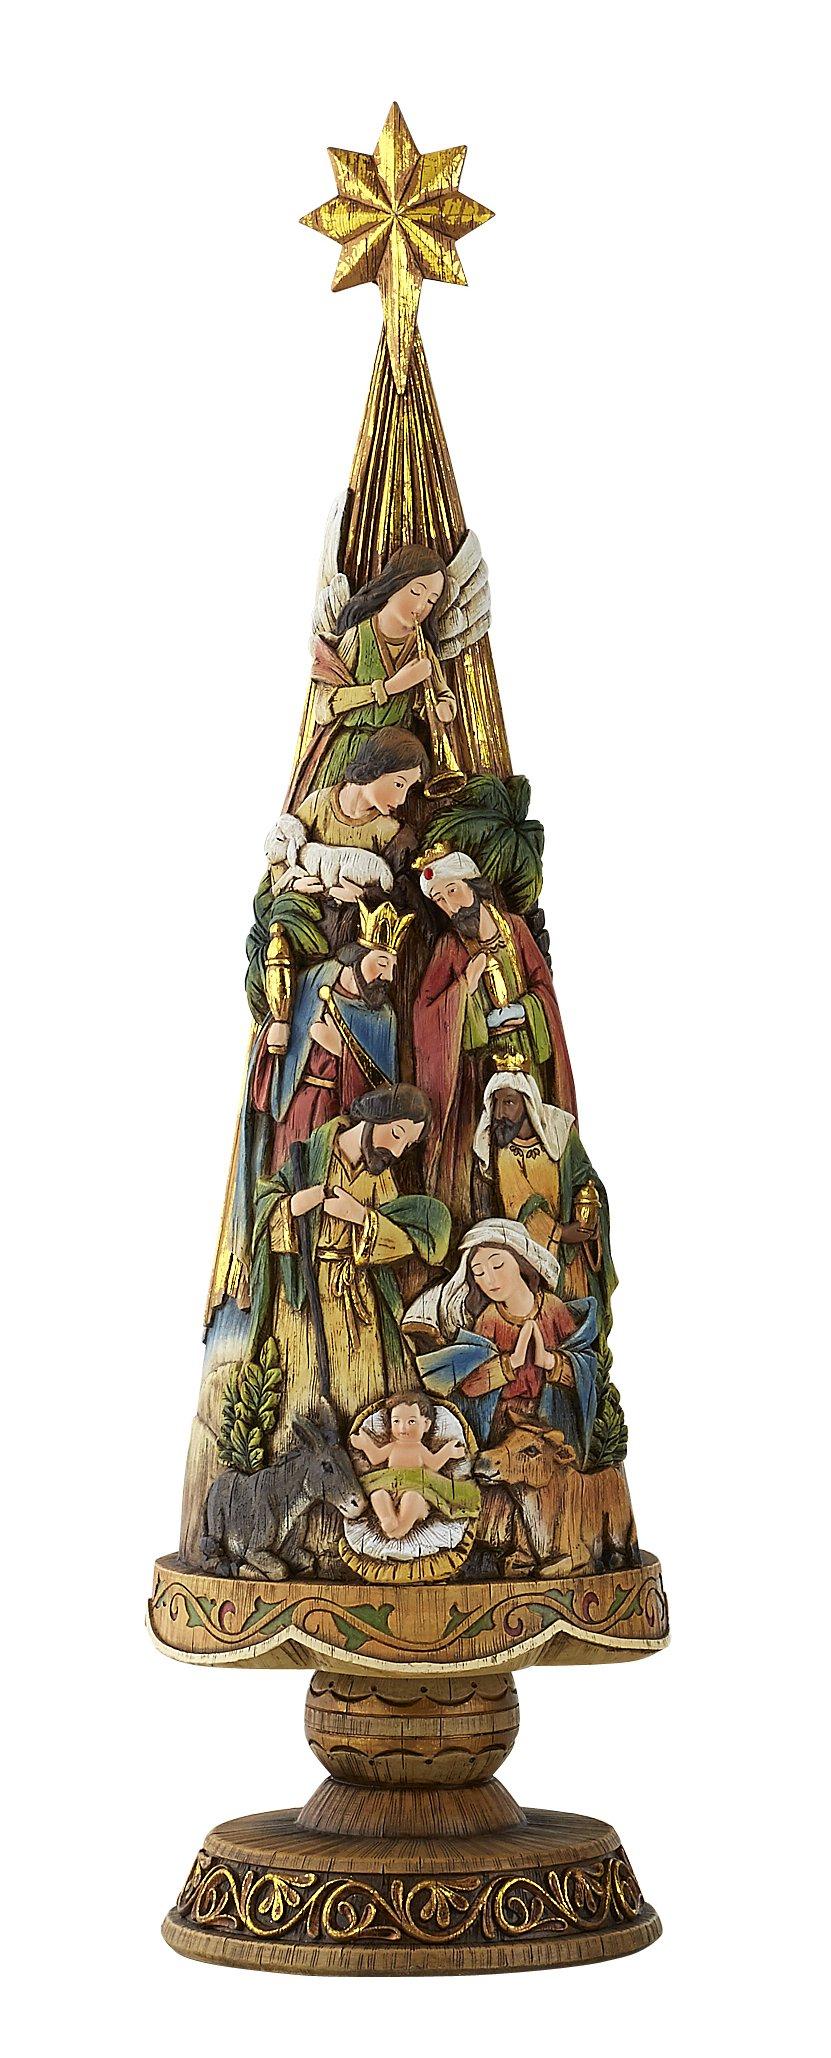 Avalon Gallery Nativity Christmas Tree Figurine